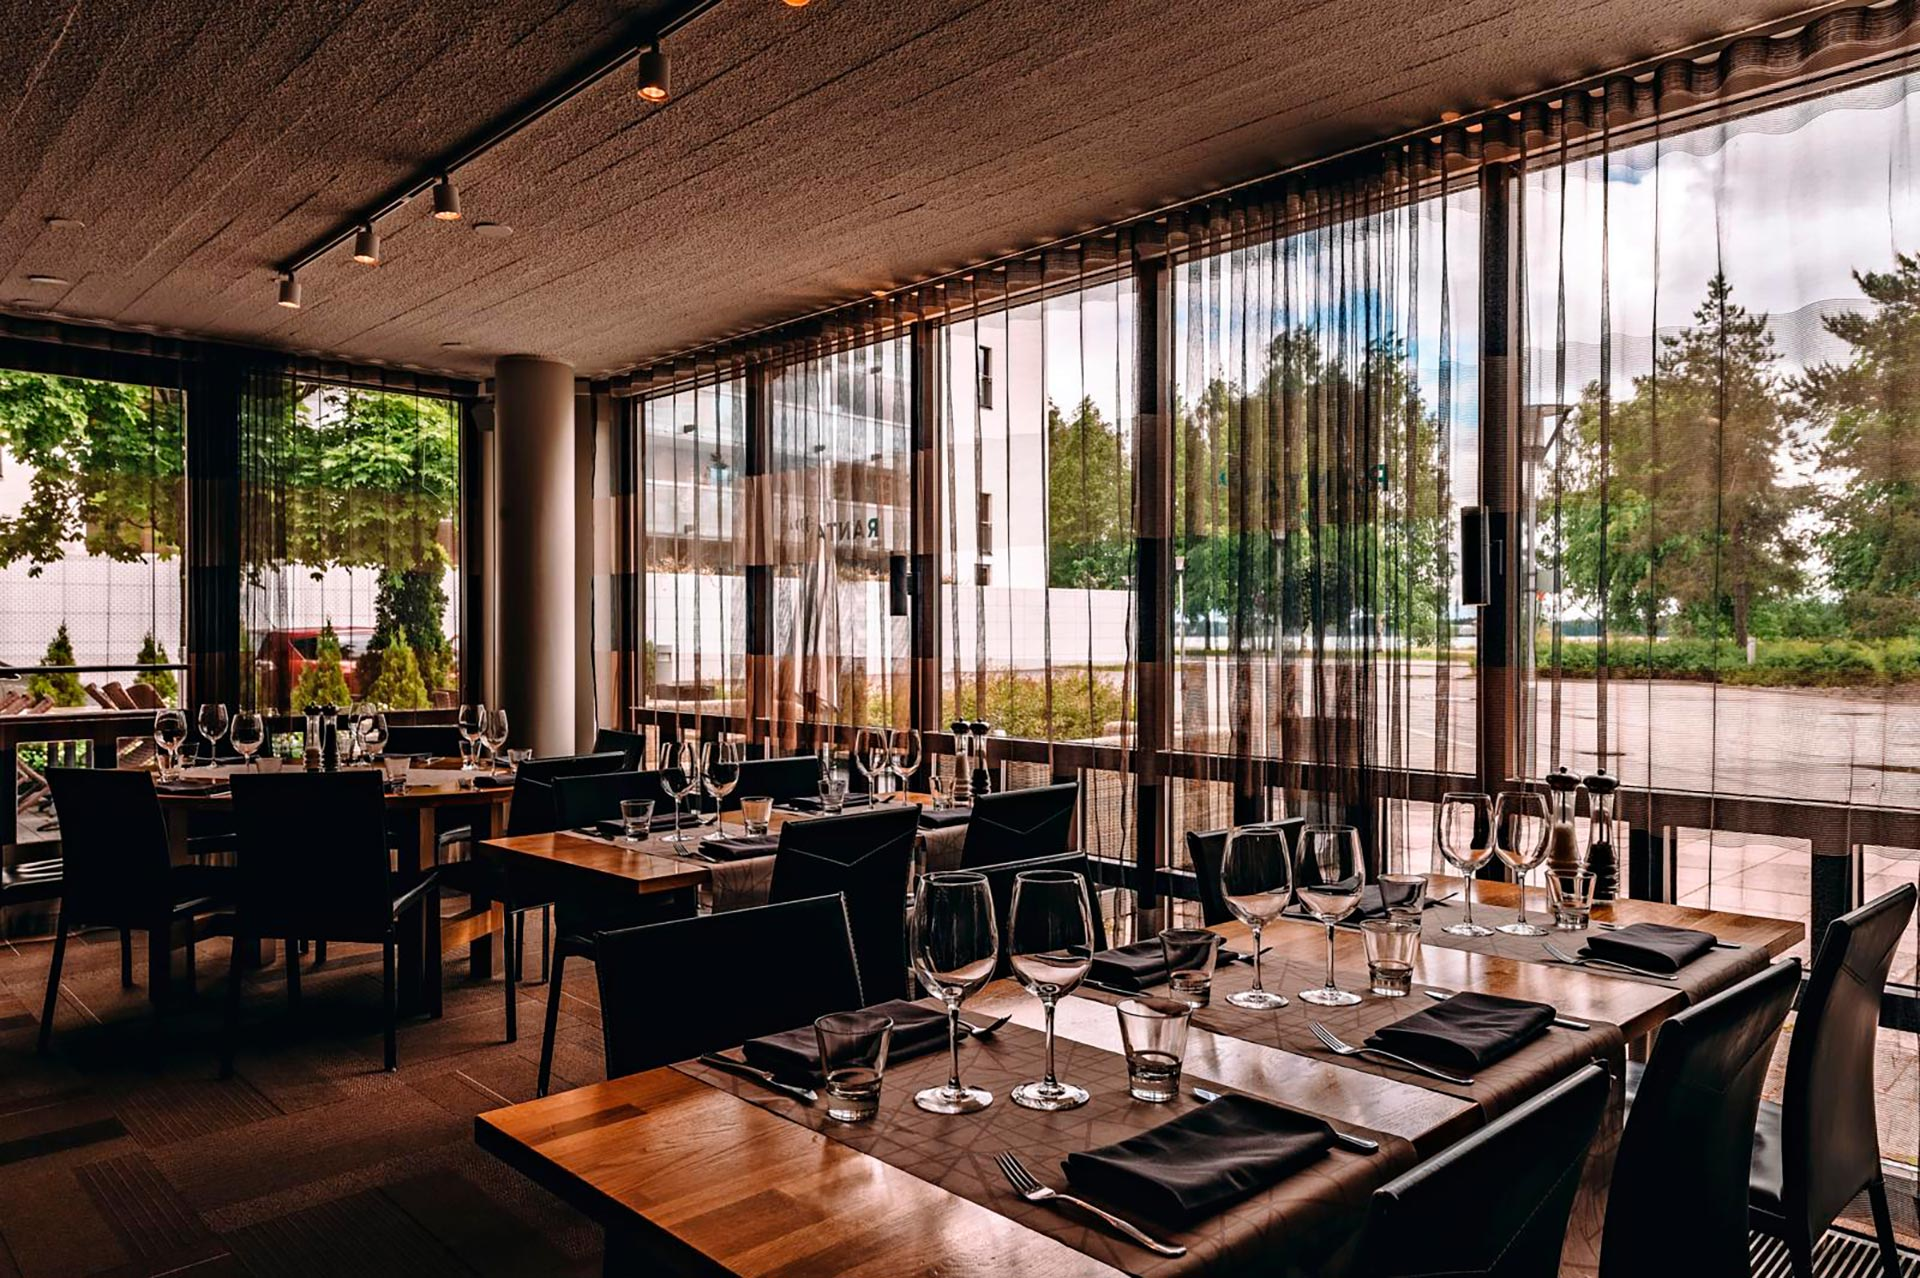 © Ranta ravintolarestaurant, Radisson Blu Espoo